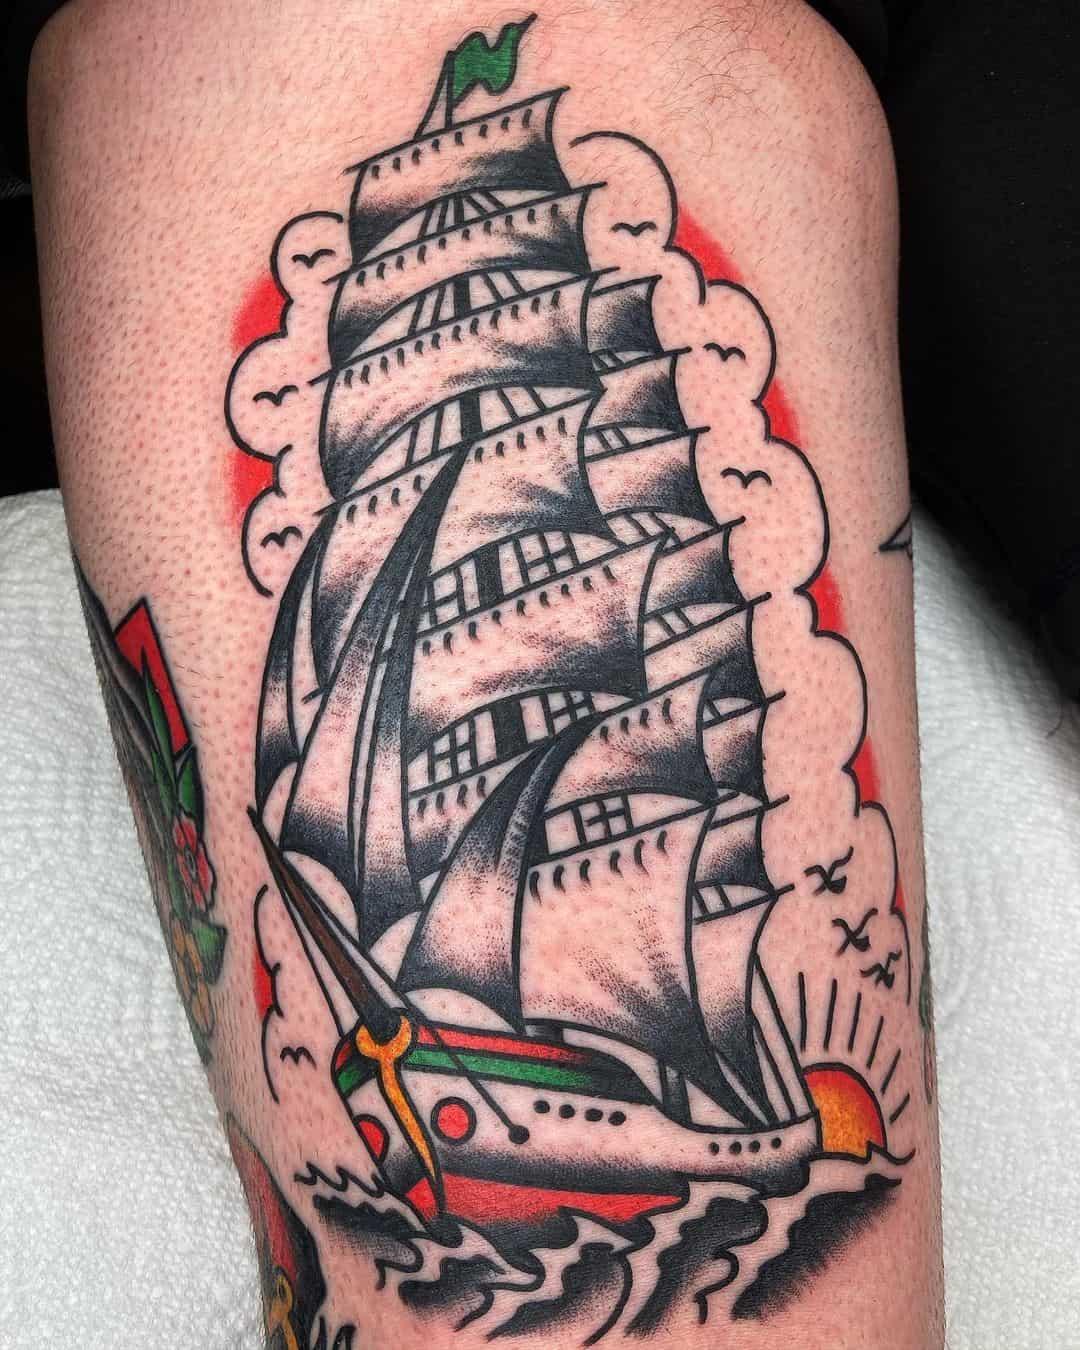 Ship tattoo 1